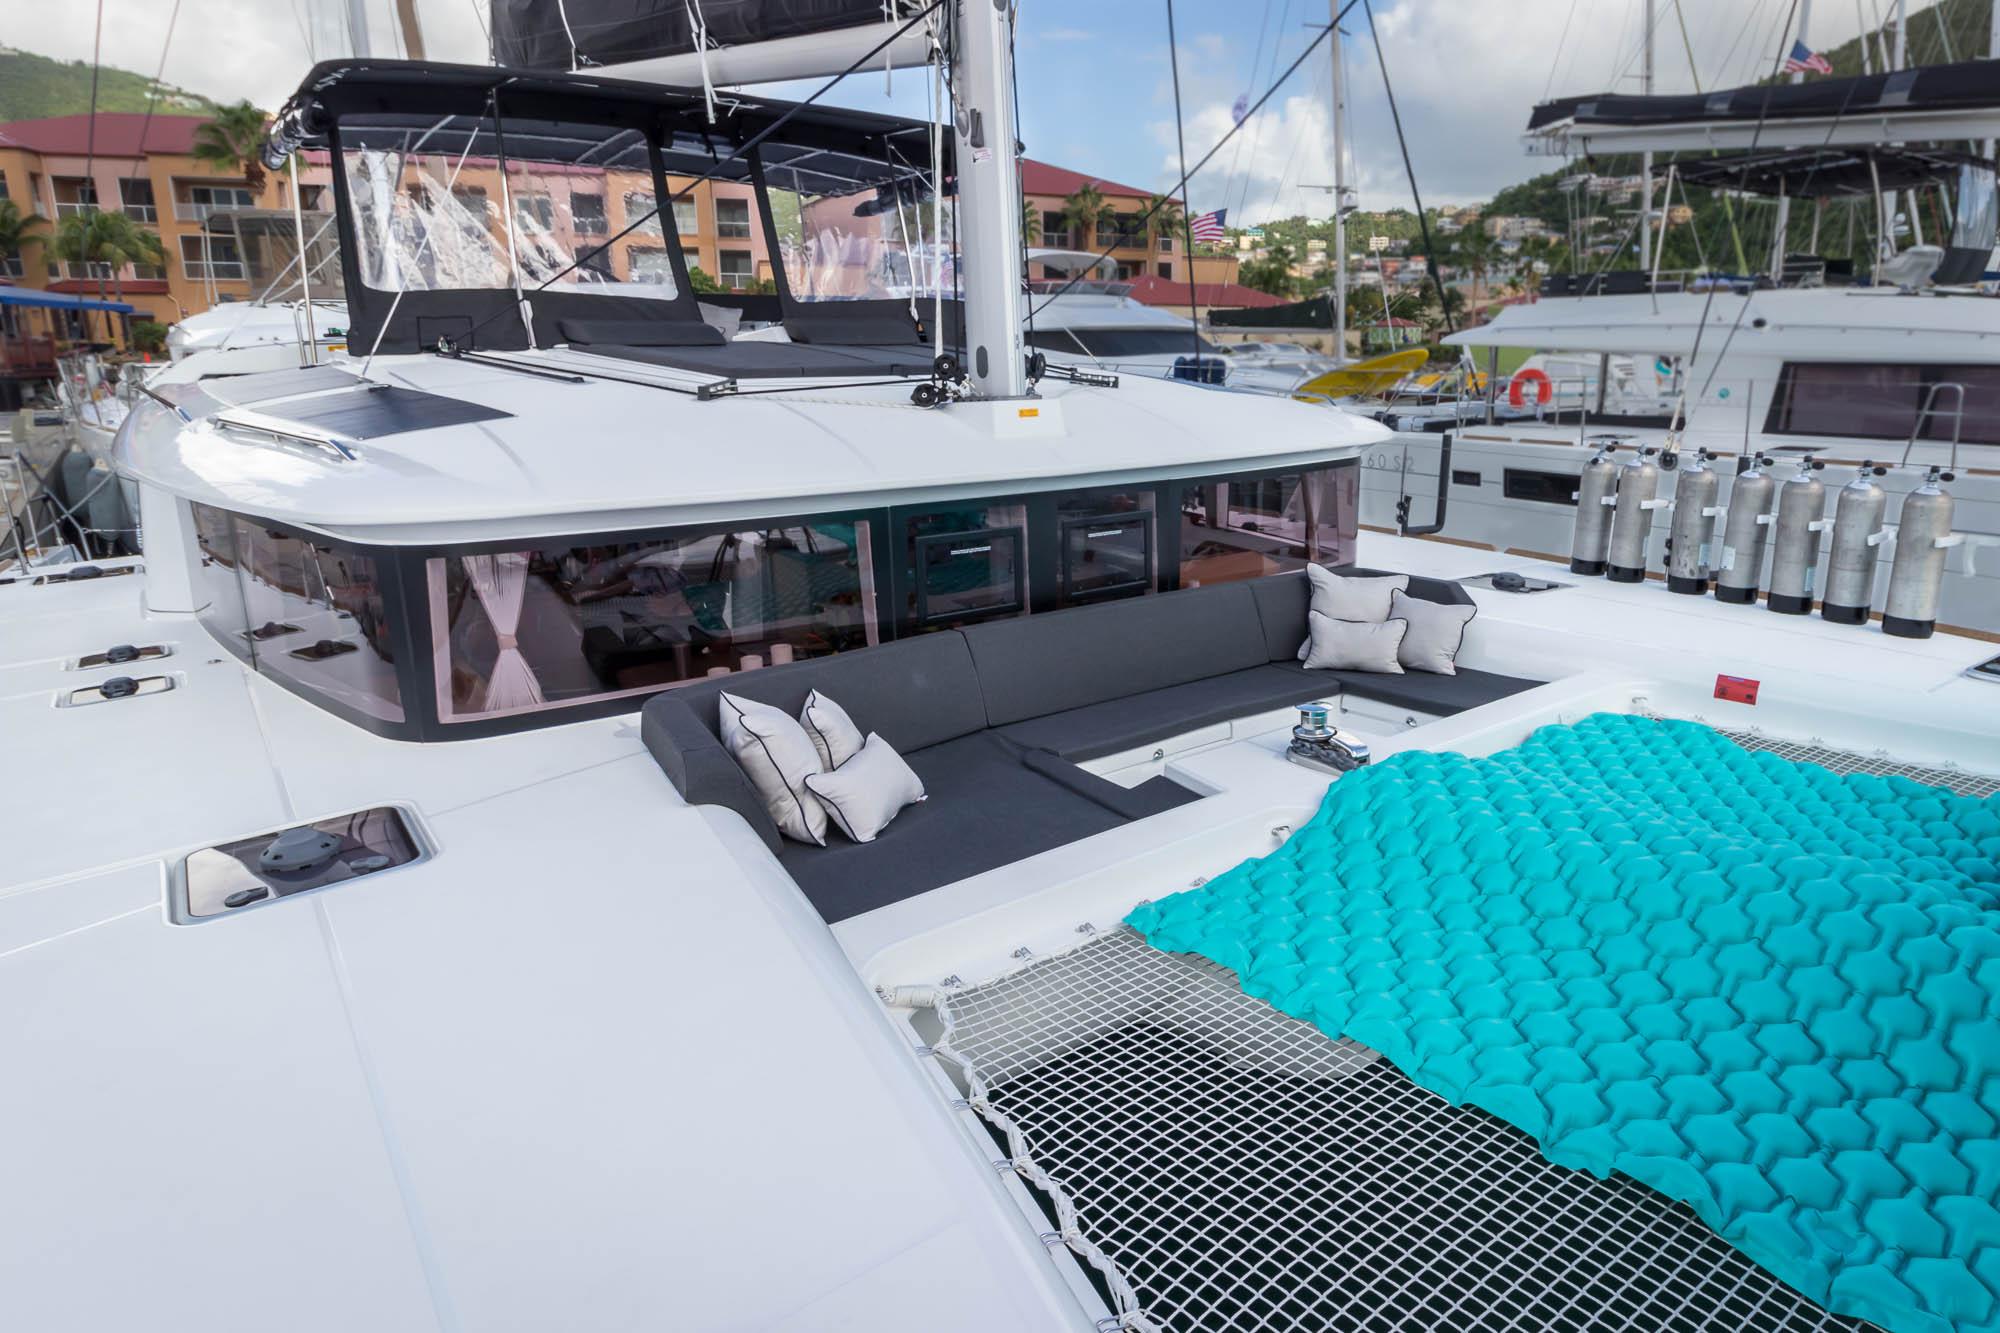 2018 Lagoon 450 charter catamaran-Flotation Therapy